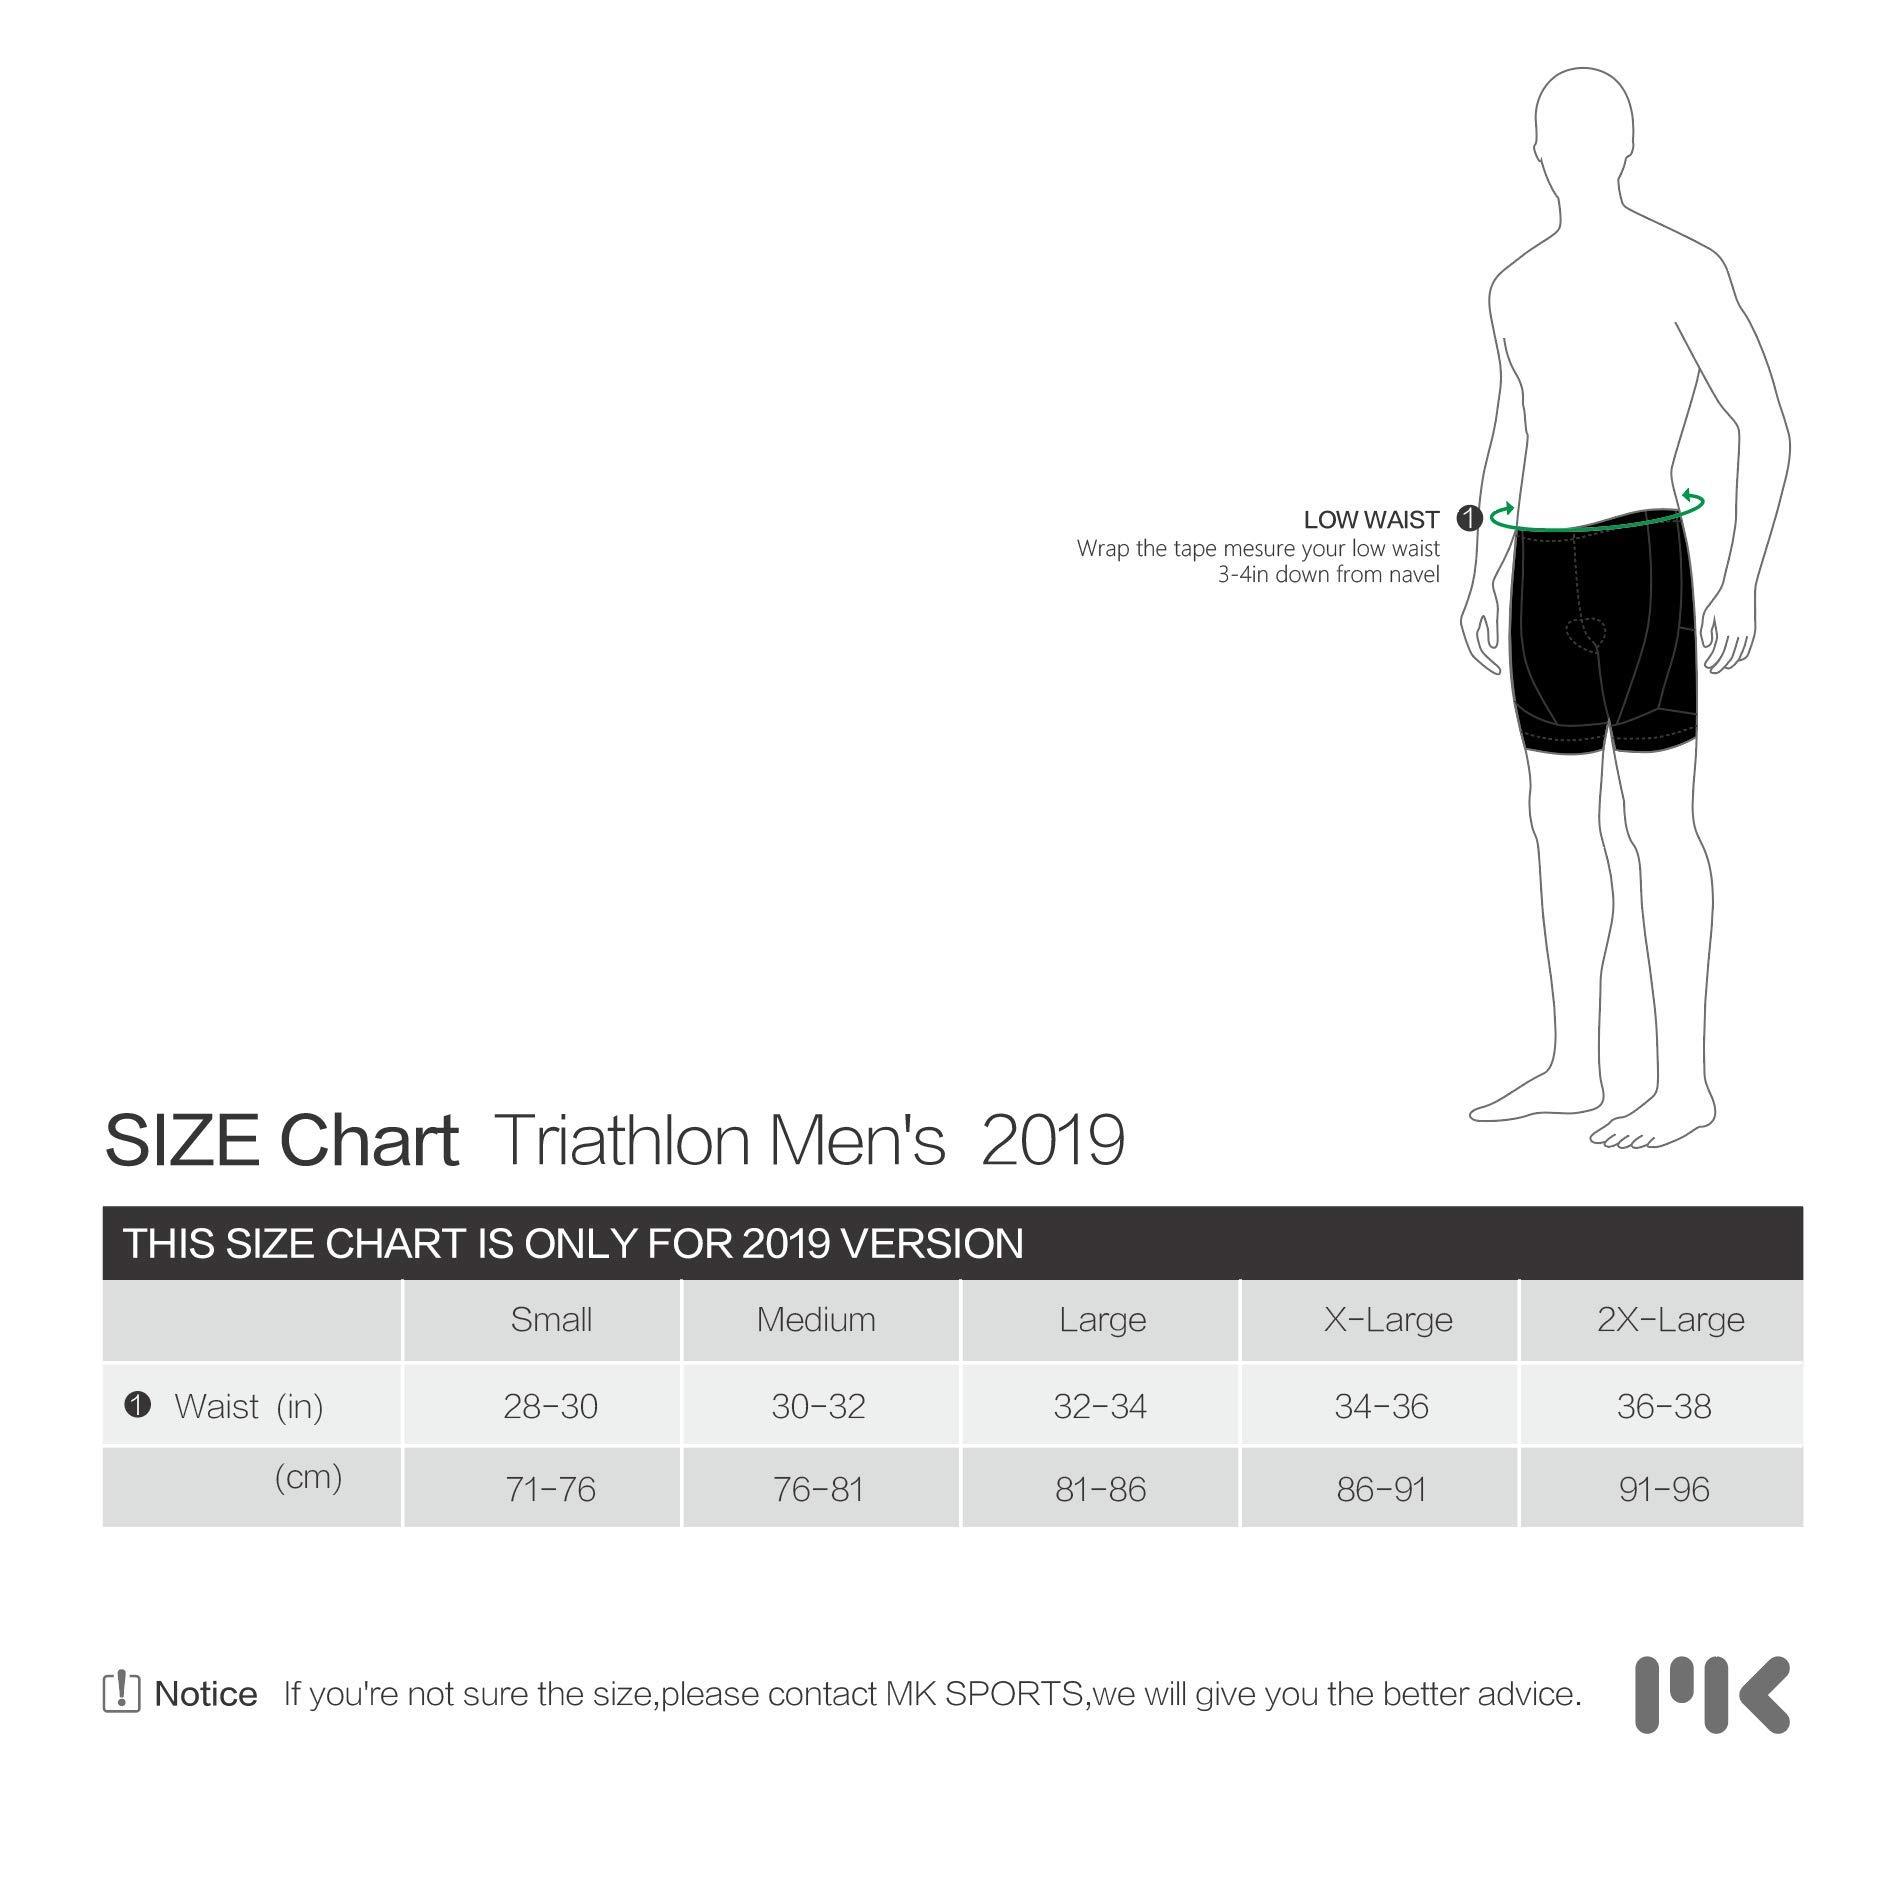 MY KILOMETRE Triathlon Shorts Mens 9'' with Adjustable Drawstring | Easy Reach Leg Pockets | Chamois for Long-Distance Tri Race Cycling Shorts by MY KILOMETRE (Image #4)